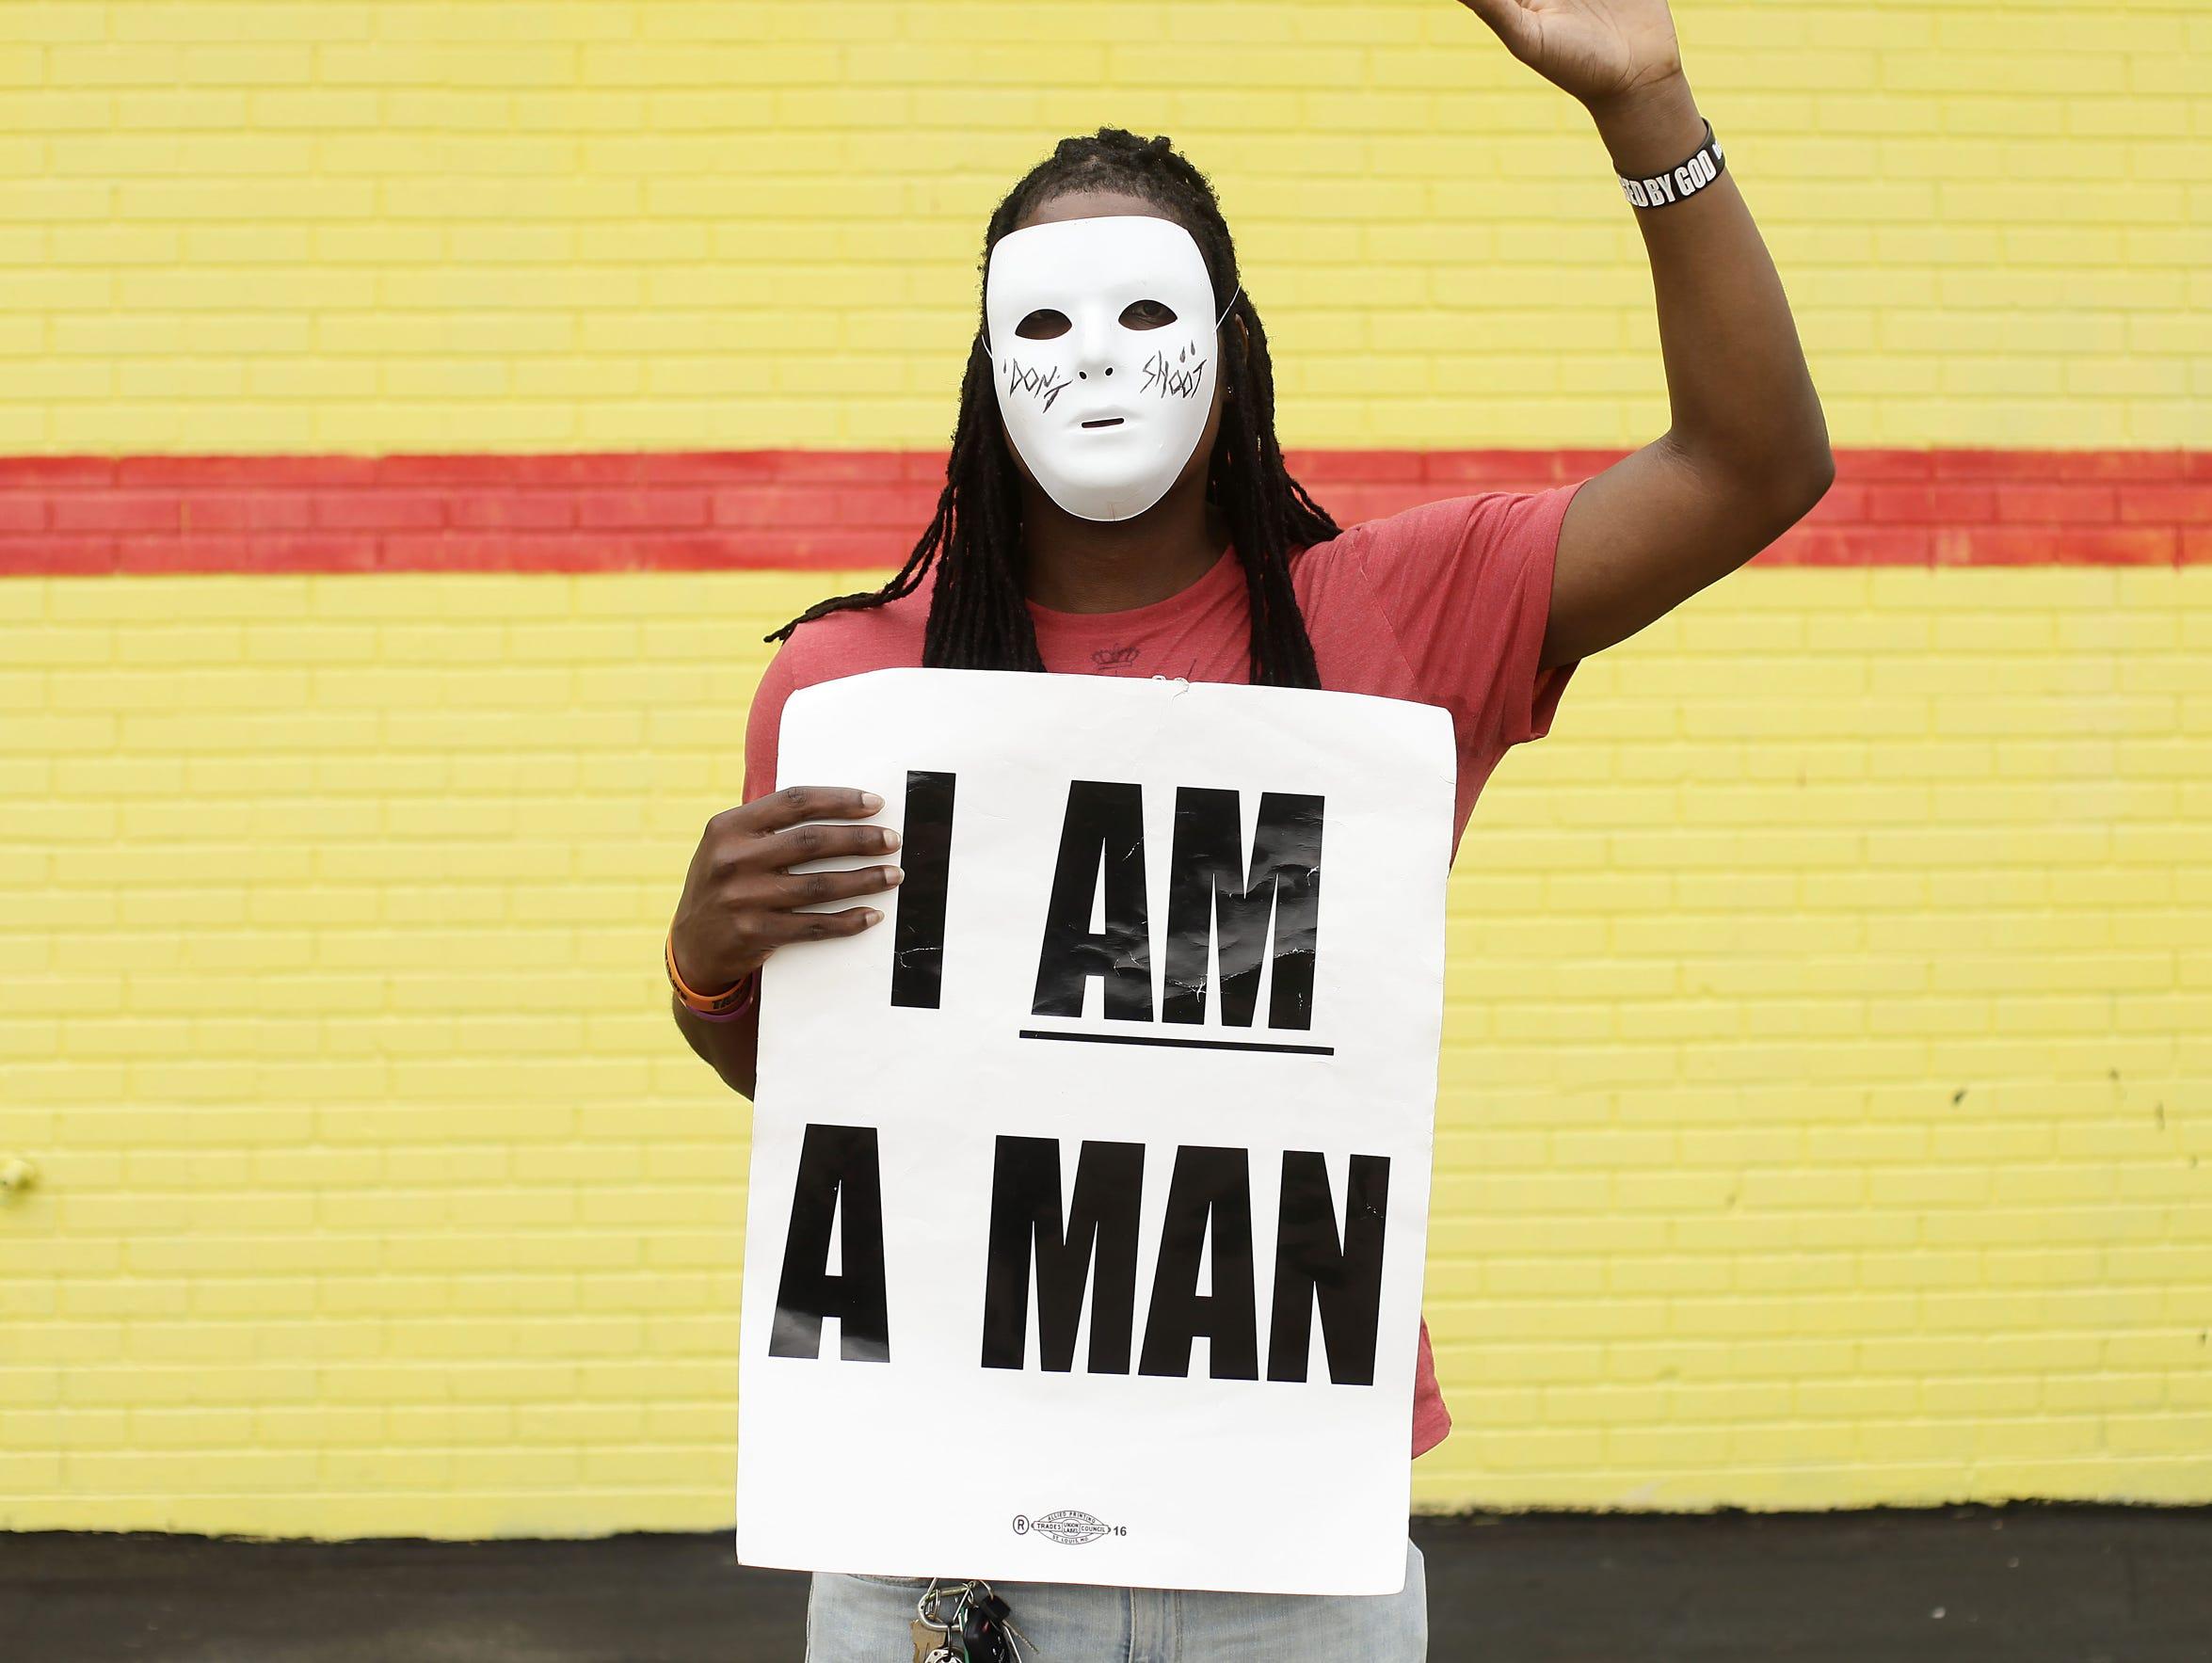 Markis Thompson, a demonstrator protesting the killing